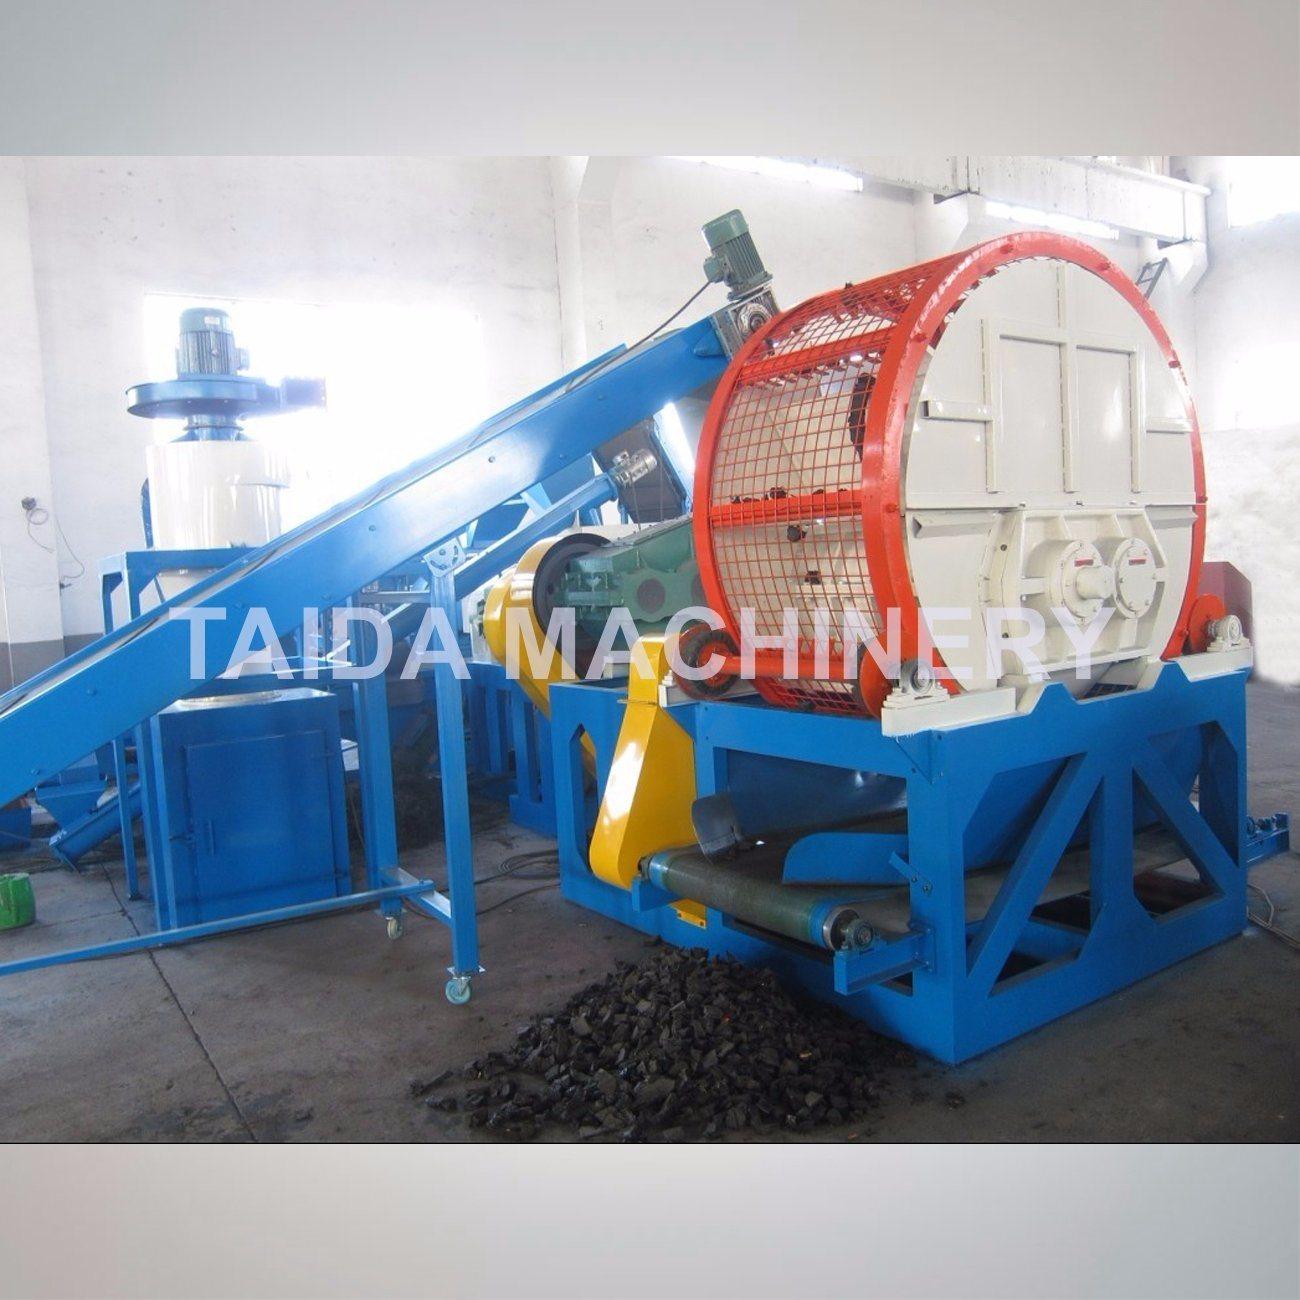 Automatic Waste Tire Recycling Shredder Crusher Cutter Grinder Rubber Cutting Machine